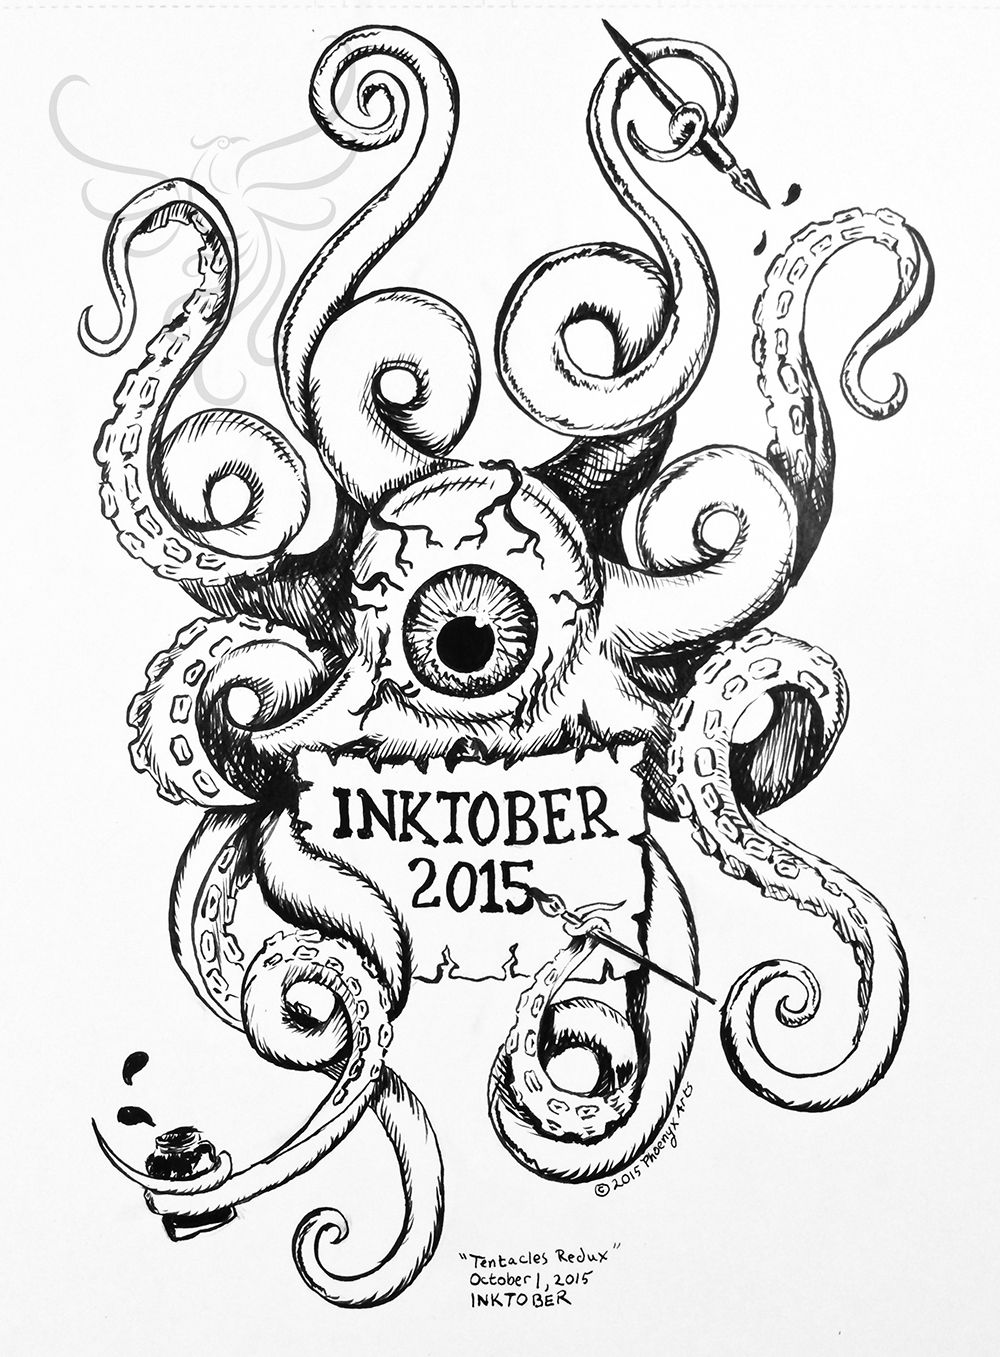 InkTober Day 1: Tentacles Redux #InkTober #InkTober2015